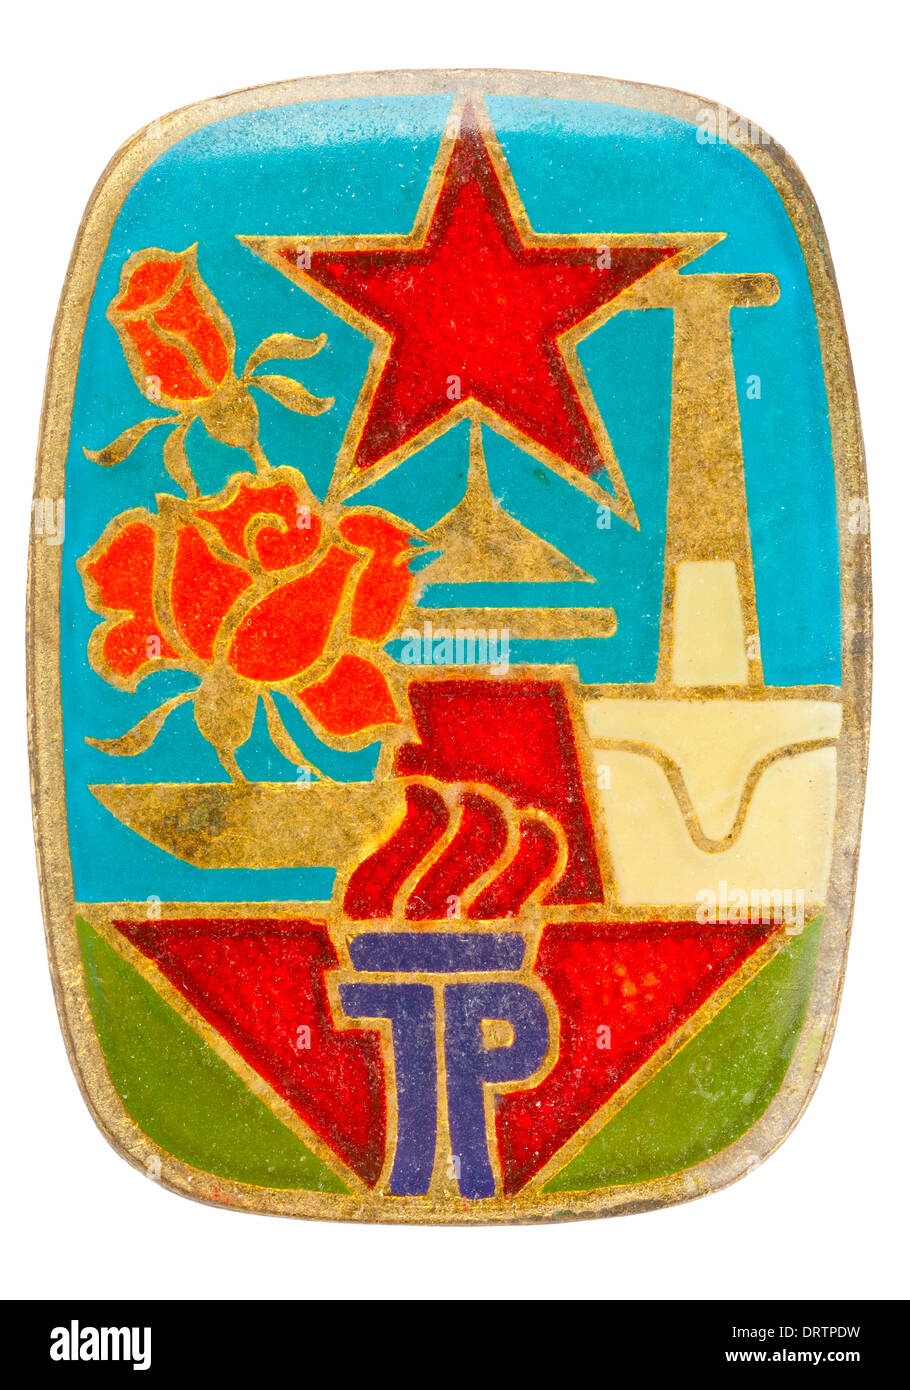 Rda (DDR) grupo de jovens (Junge Pioniere) monograma Imagens de Stock